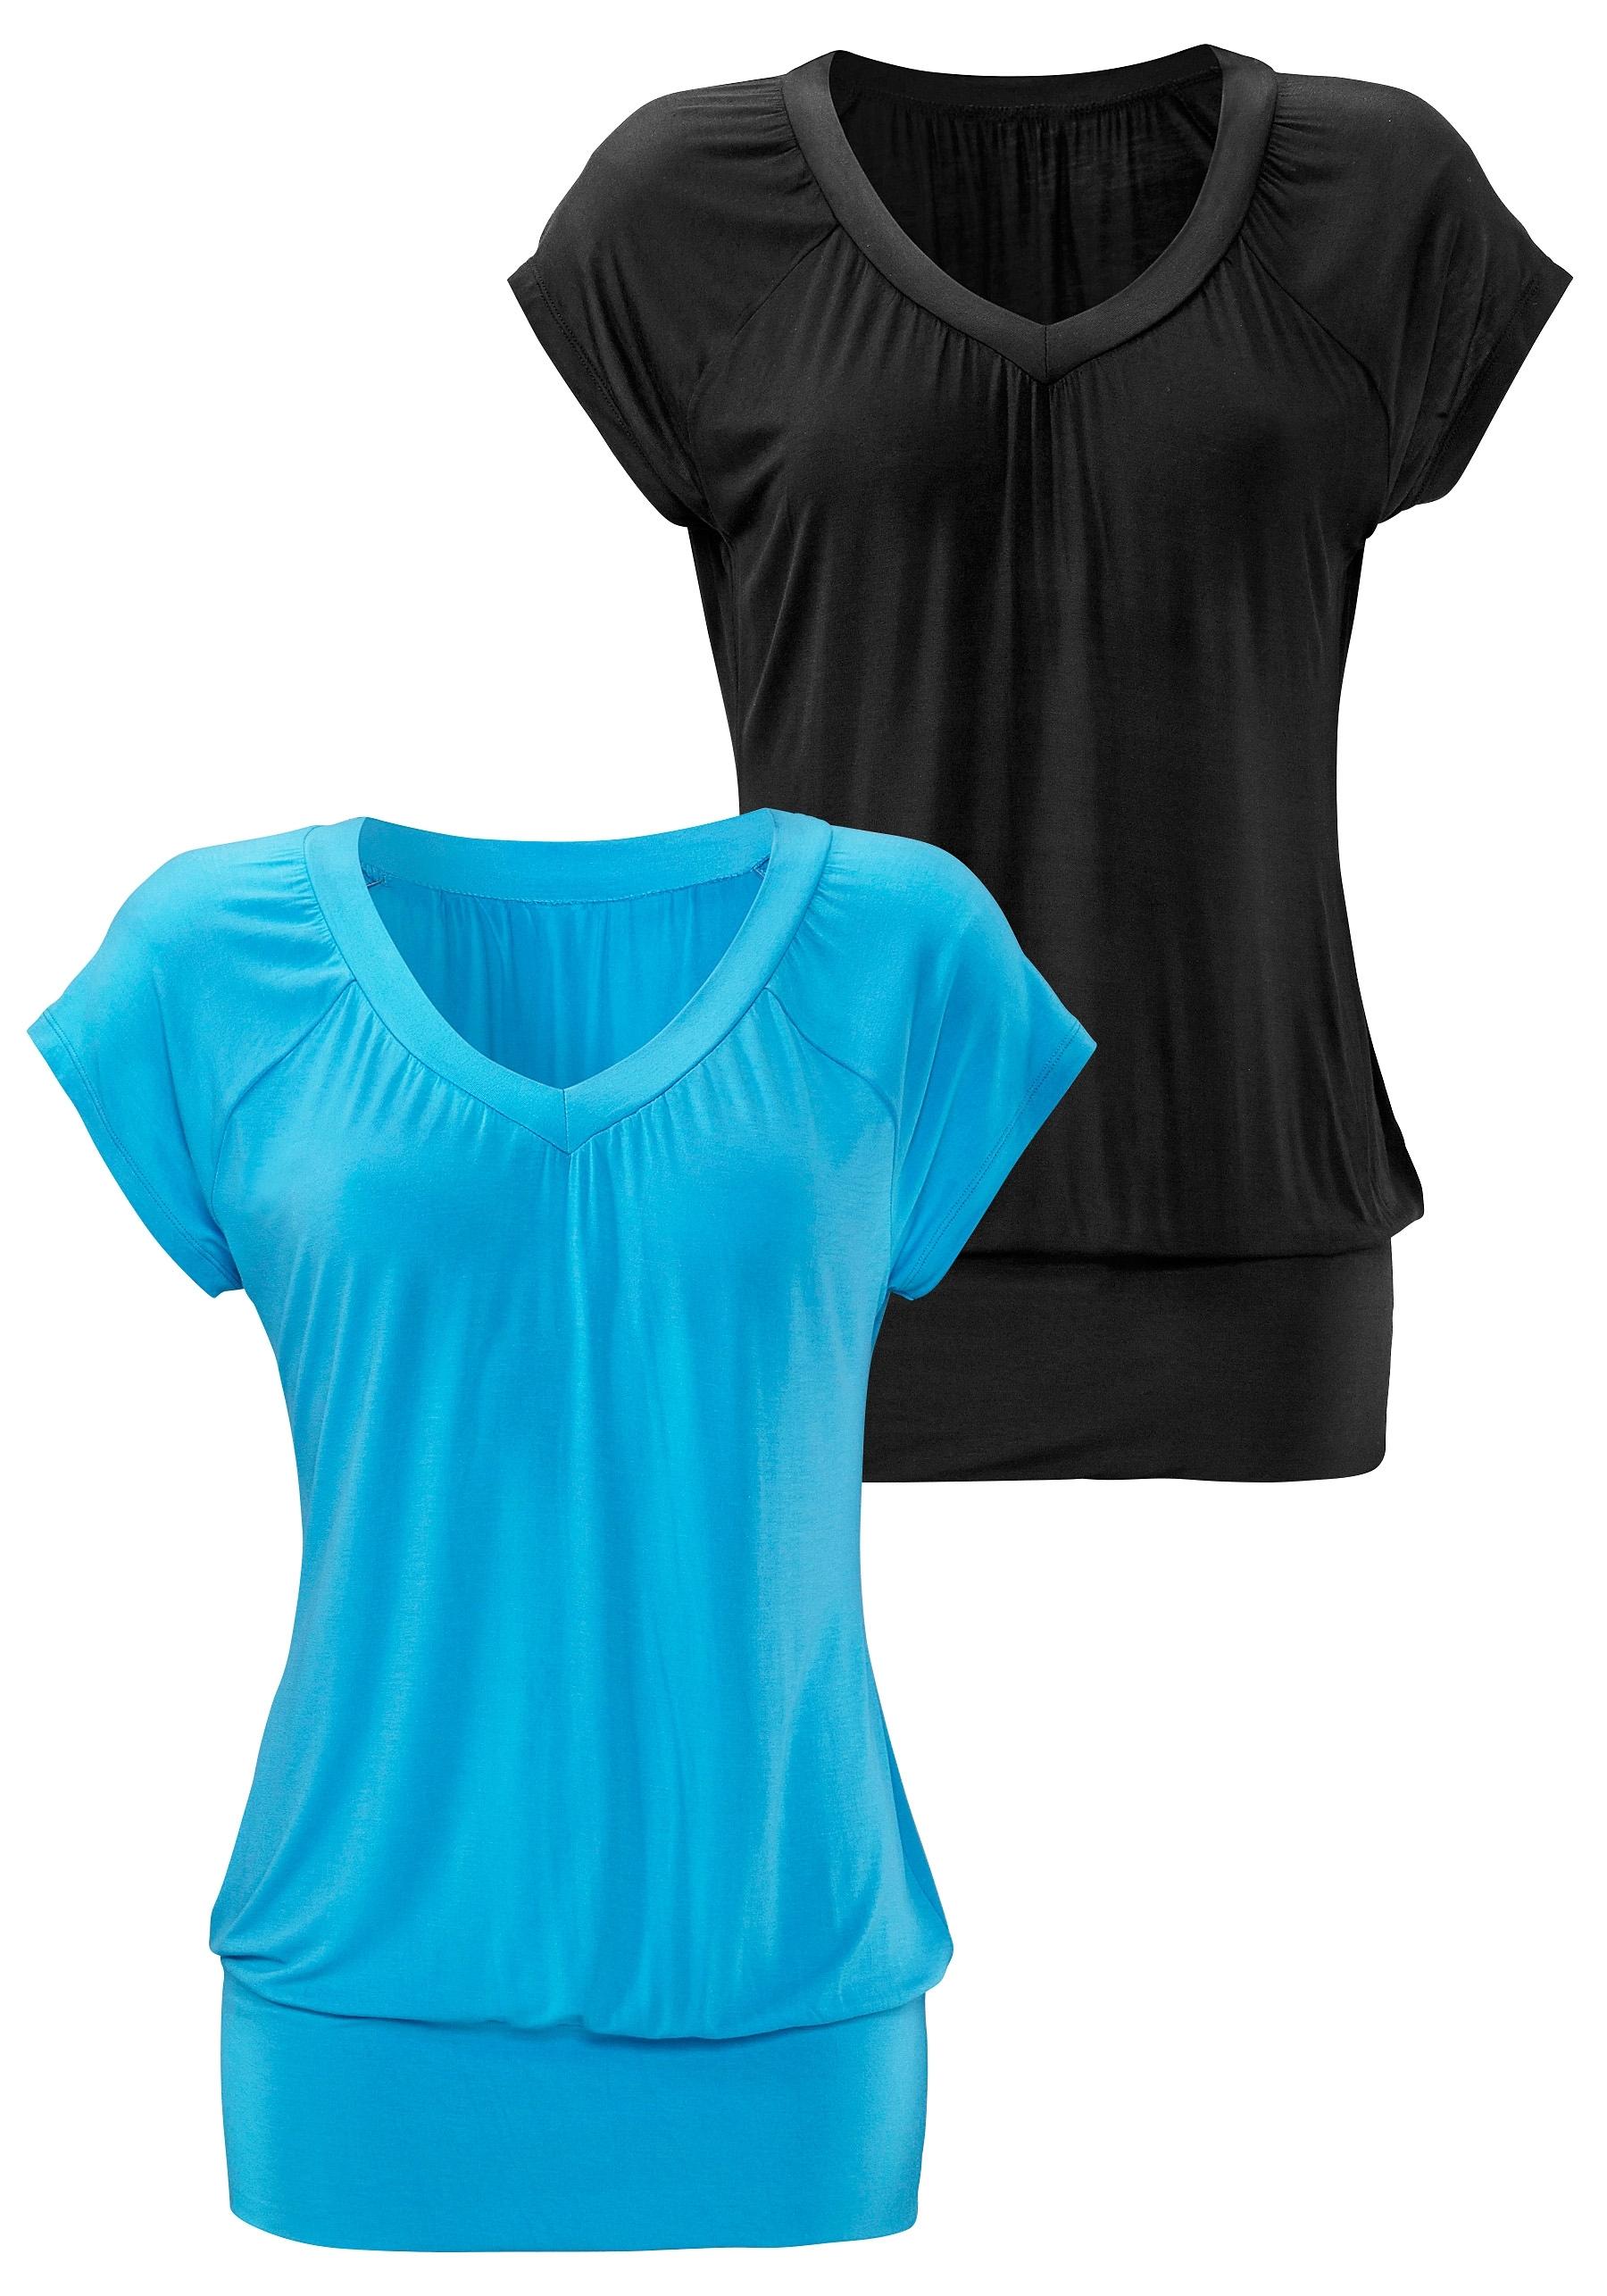 883bf7bfdf5d80 LASCANA shirt met V-hals en brede boord (set van 2) in de online ...